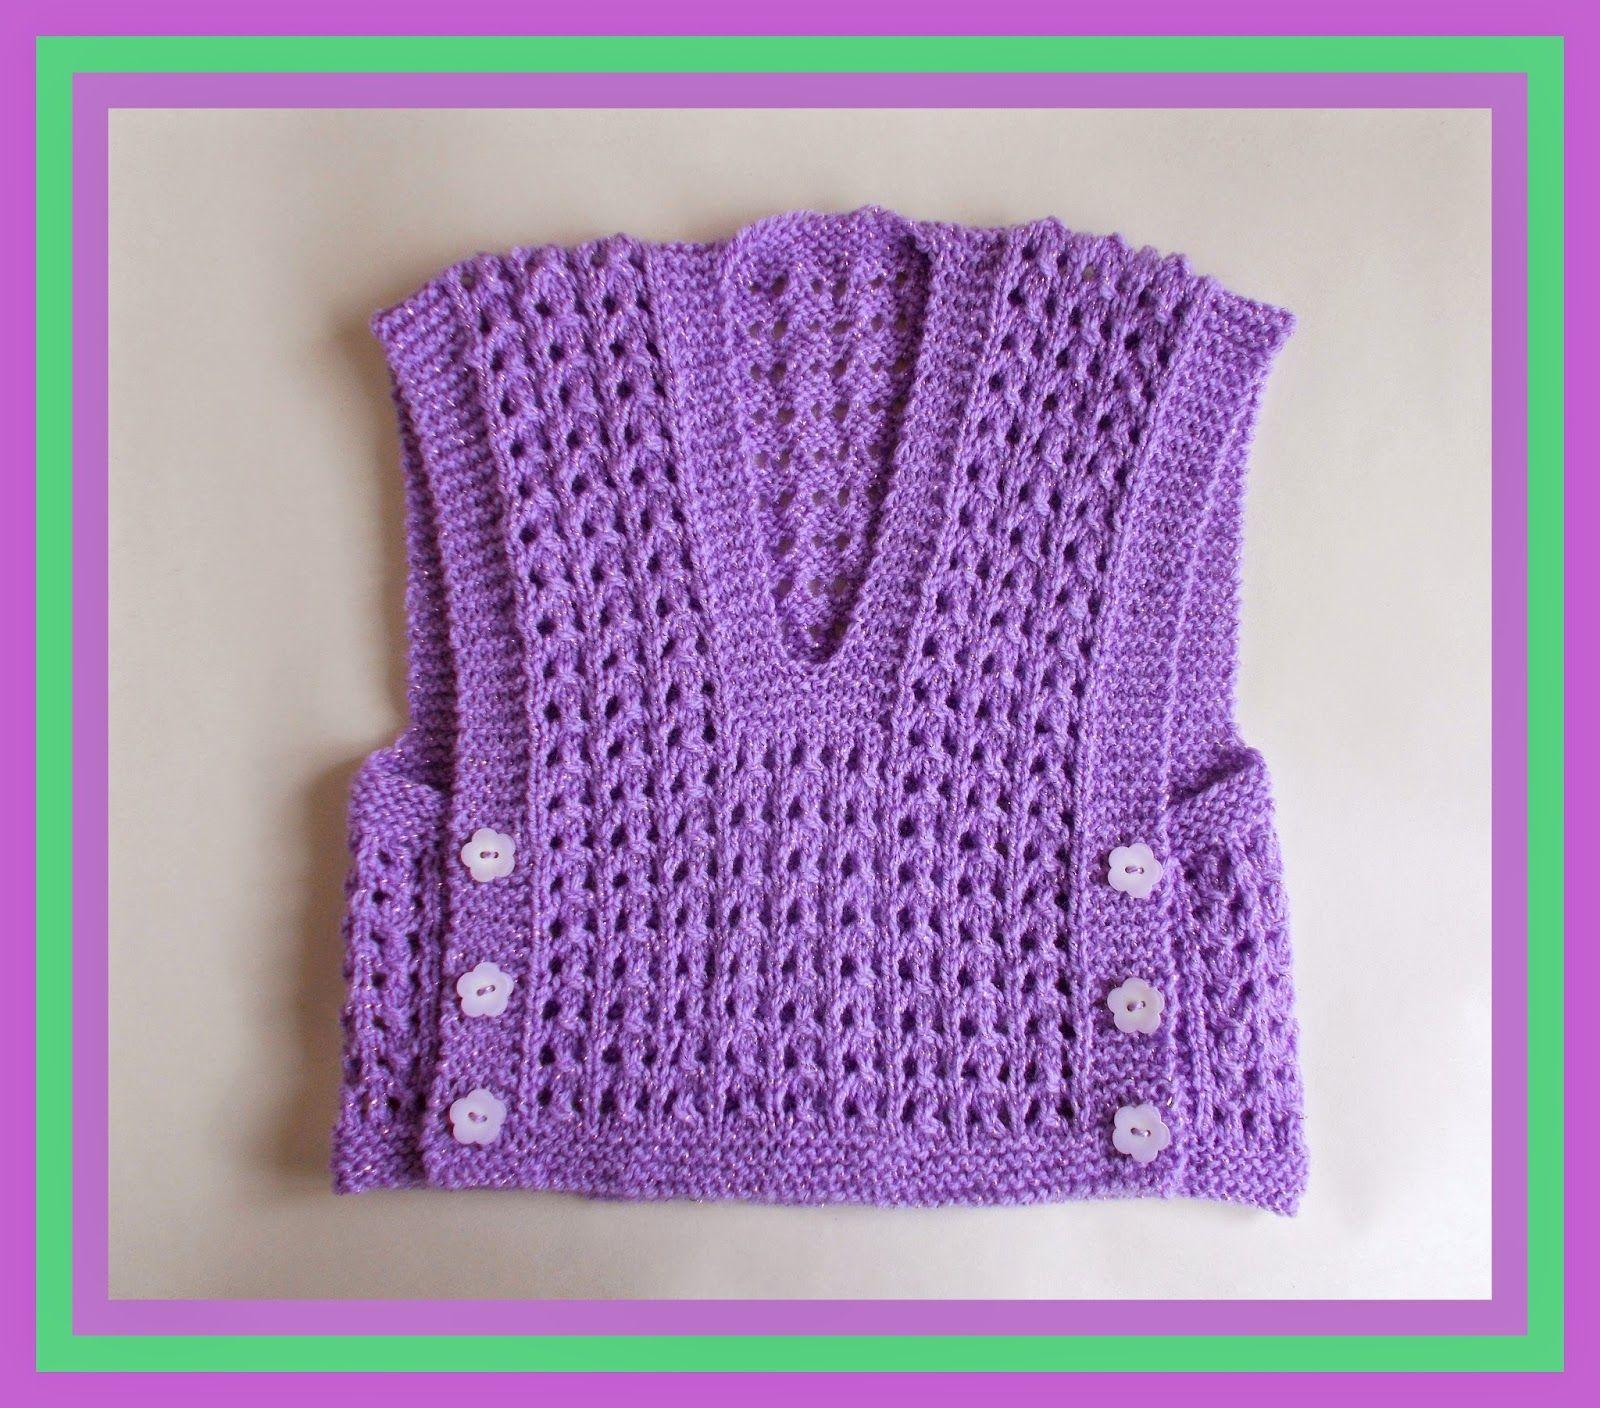 marianna\'s lazy daisy days: Melika Lacy Baby Vest Top with side ...